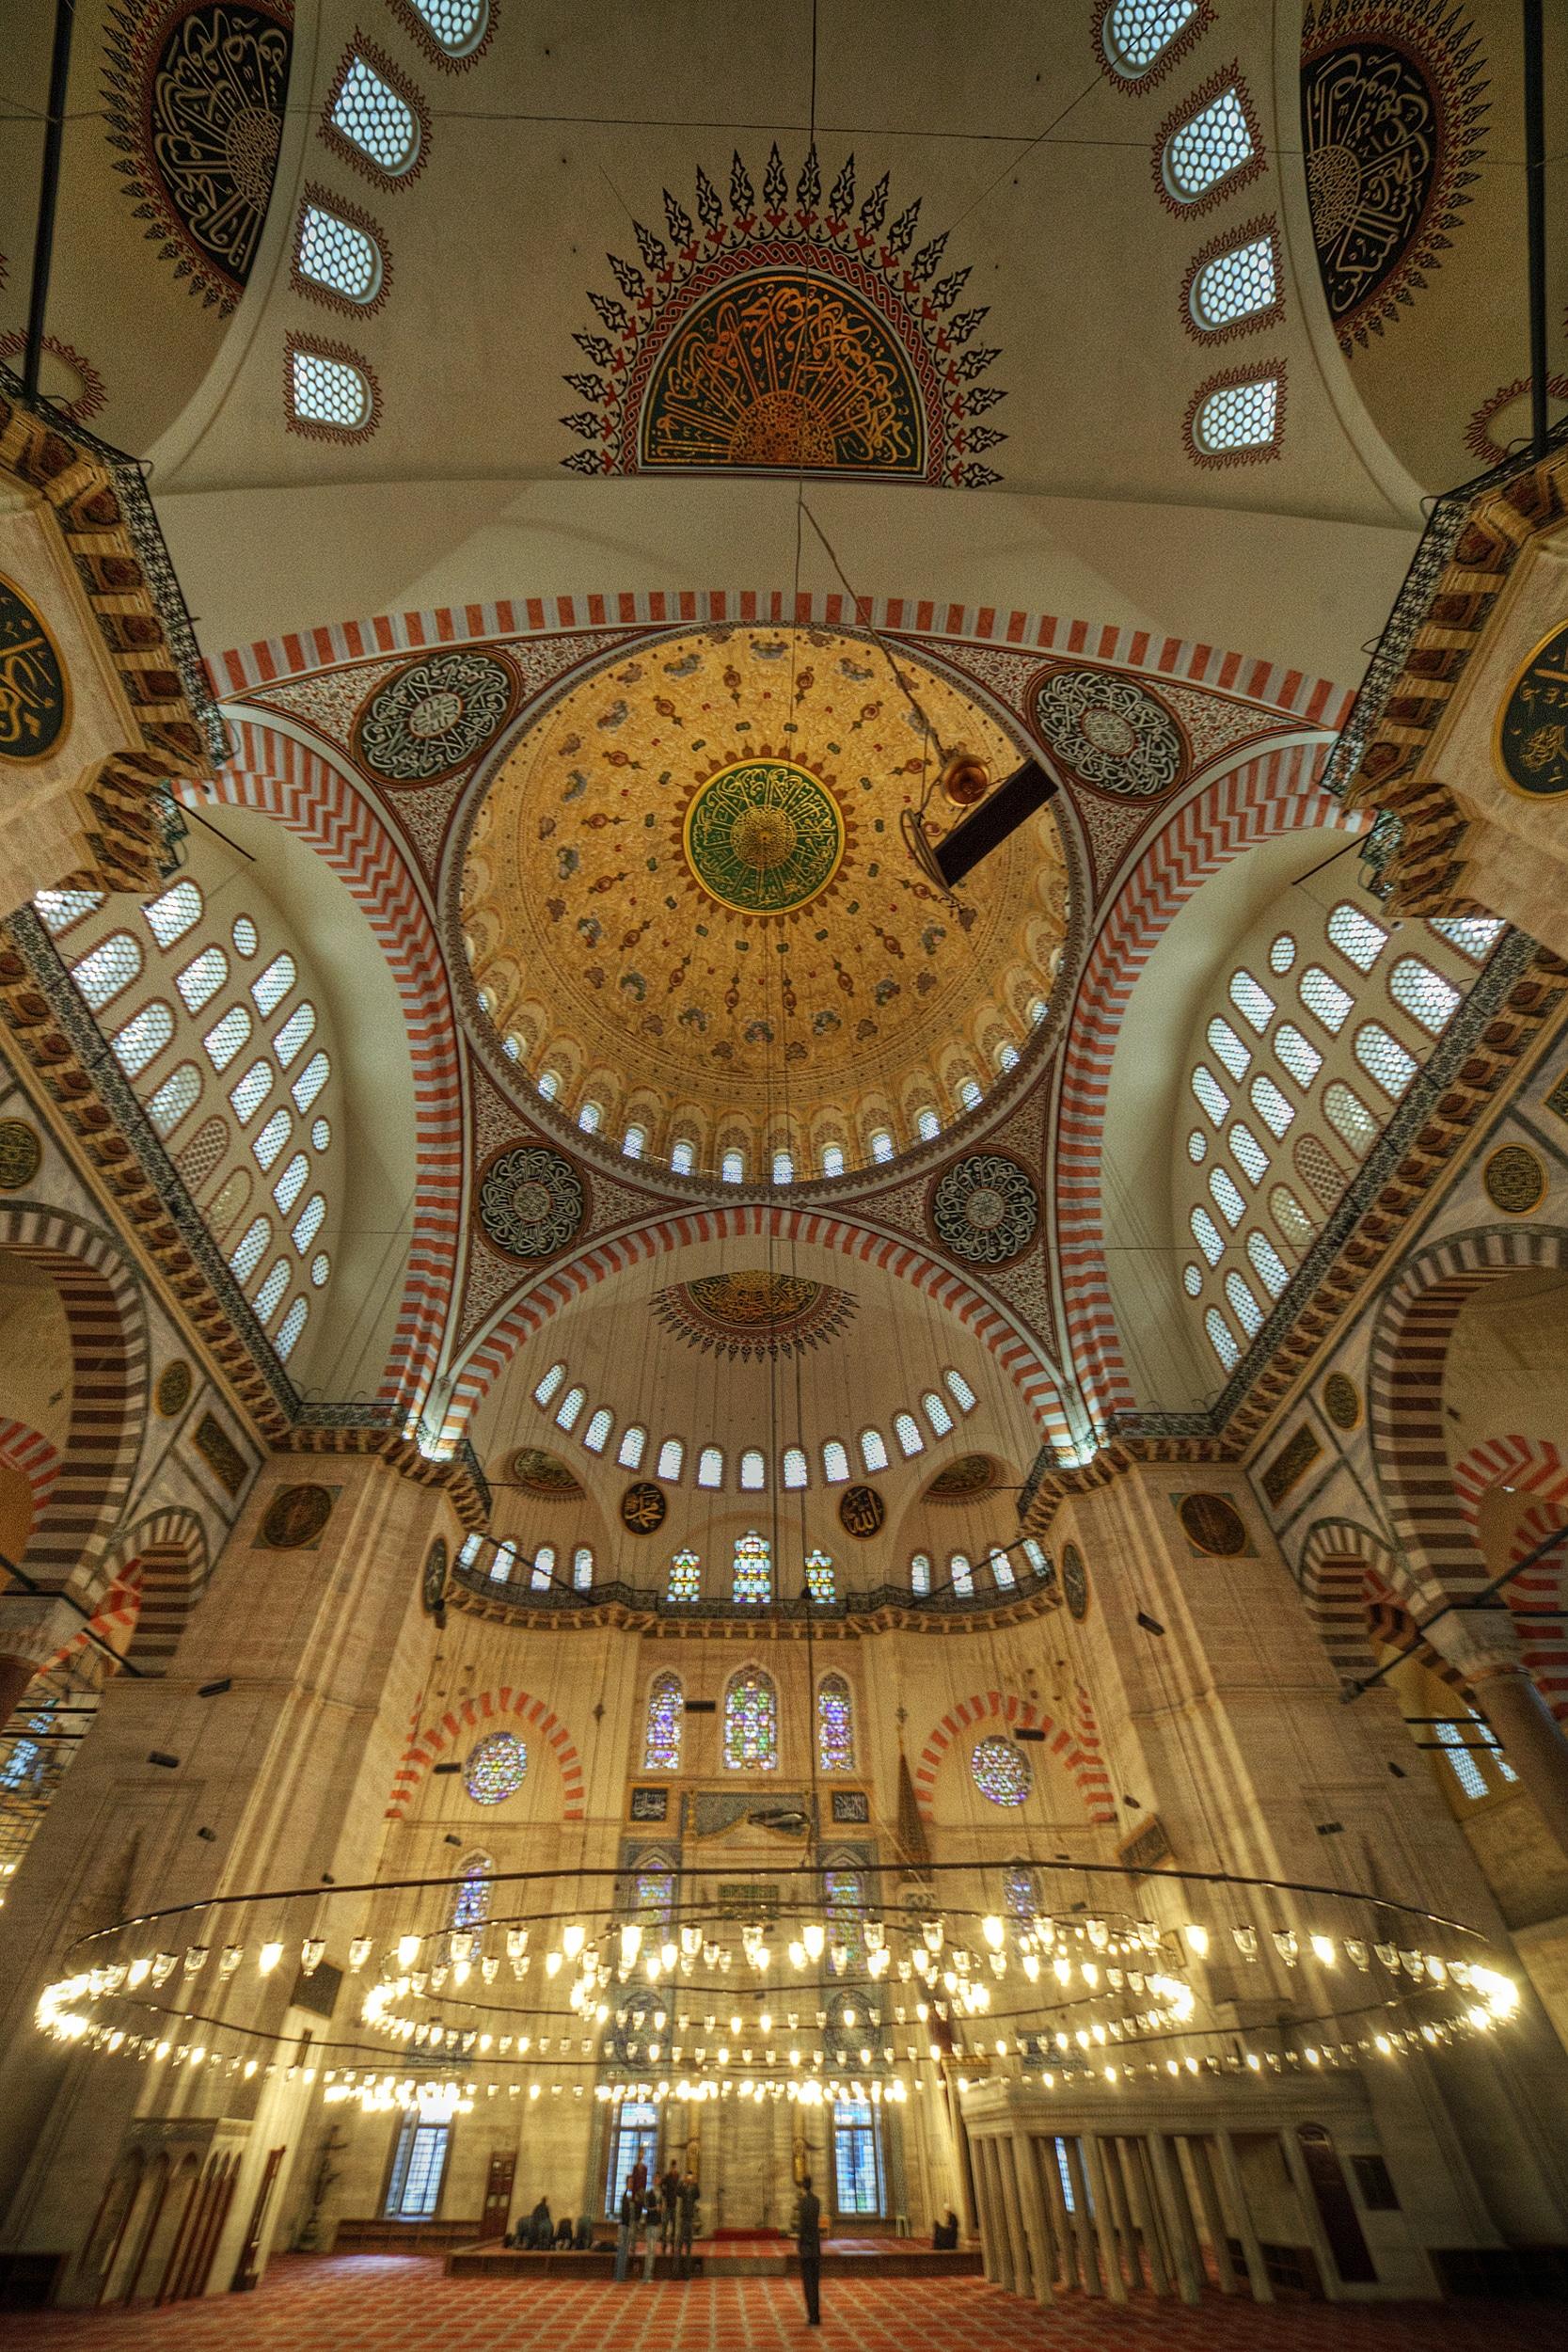 Fastuoasa Moschee a lui Suleiman